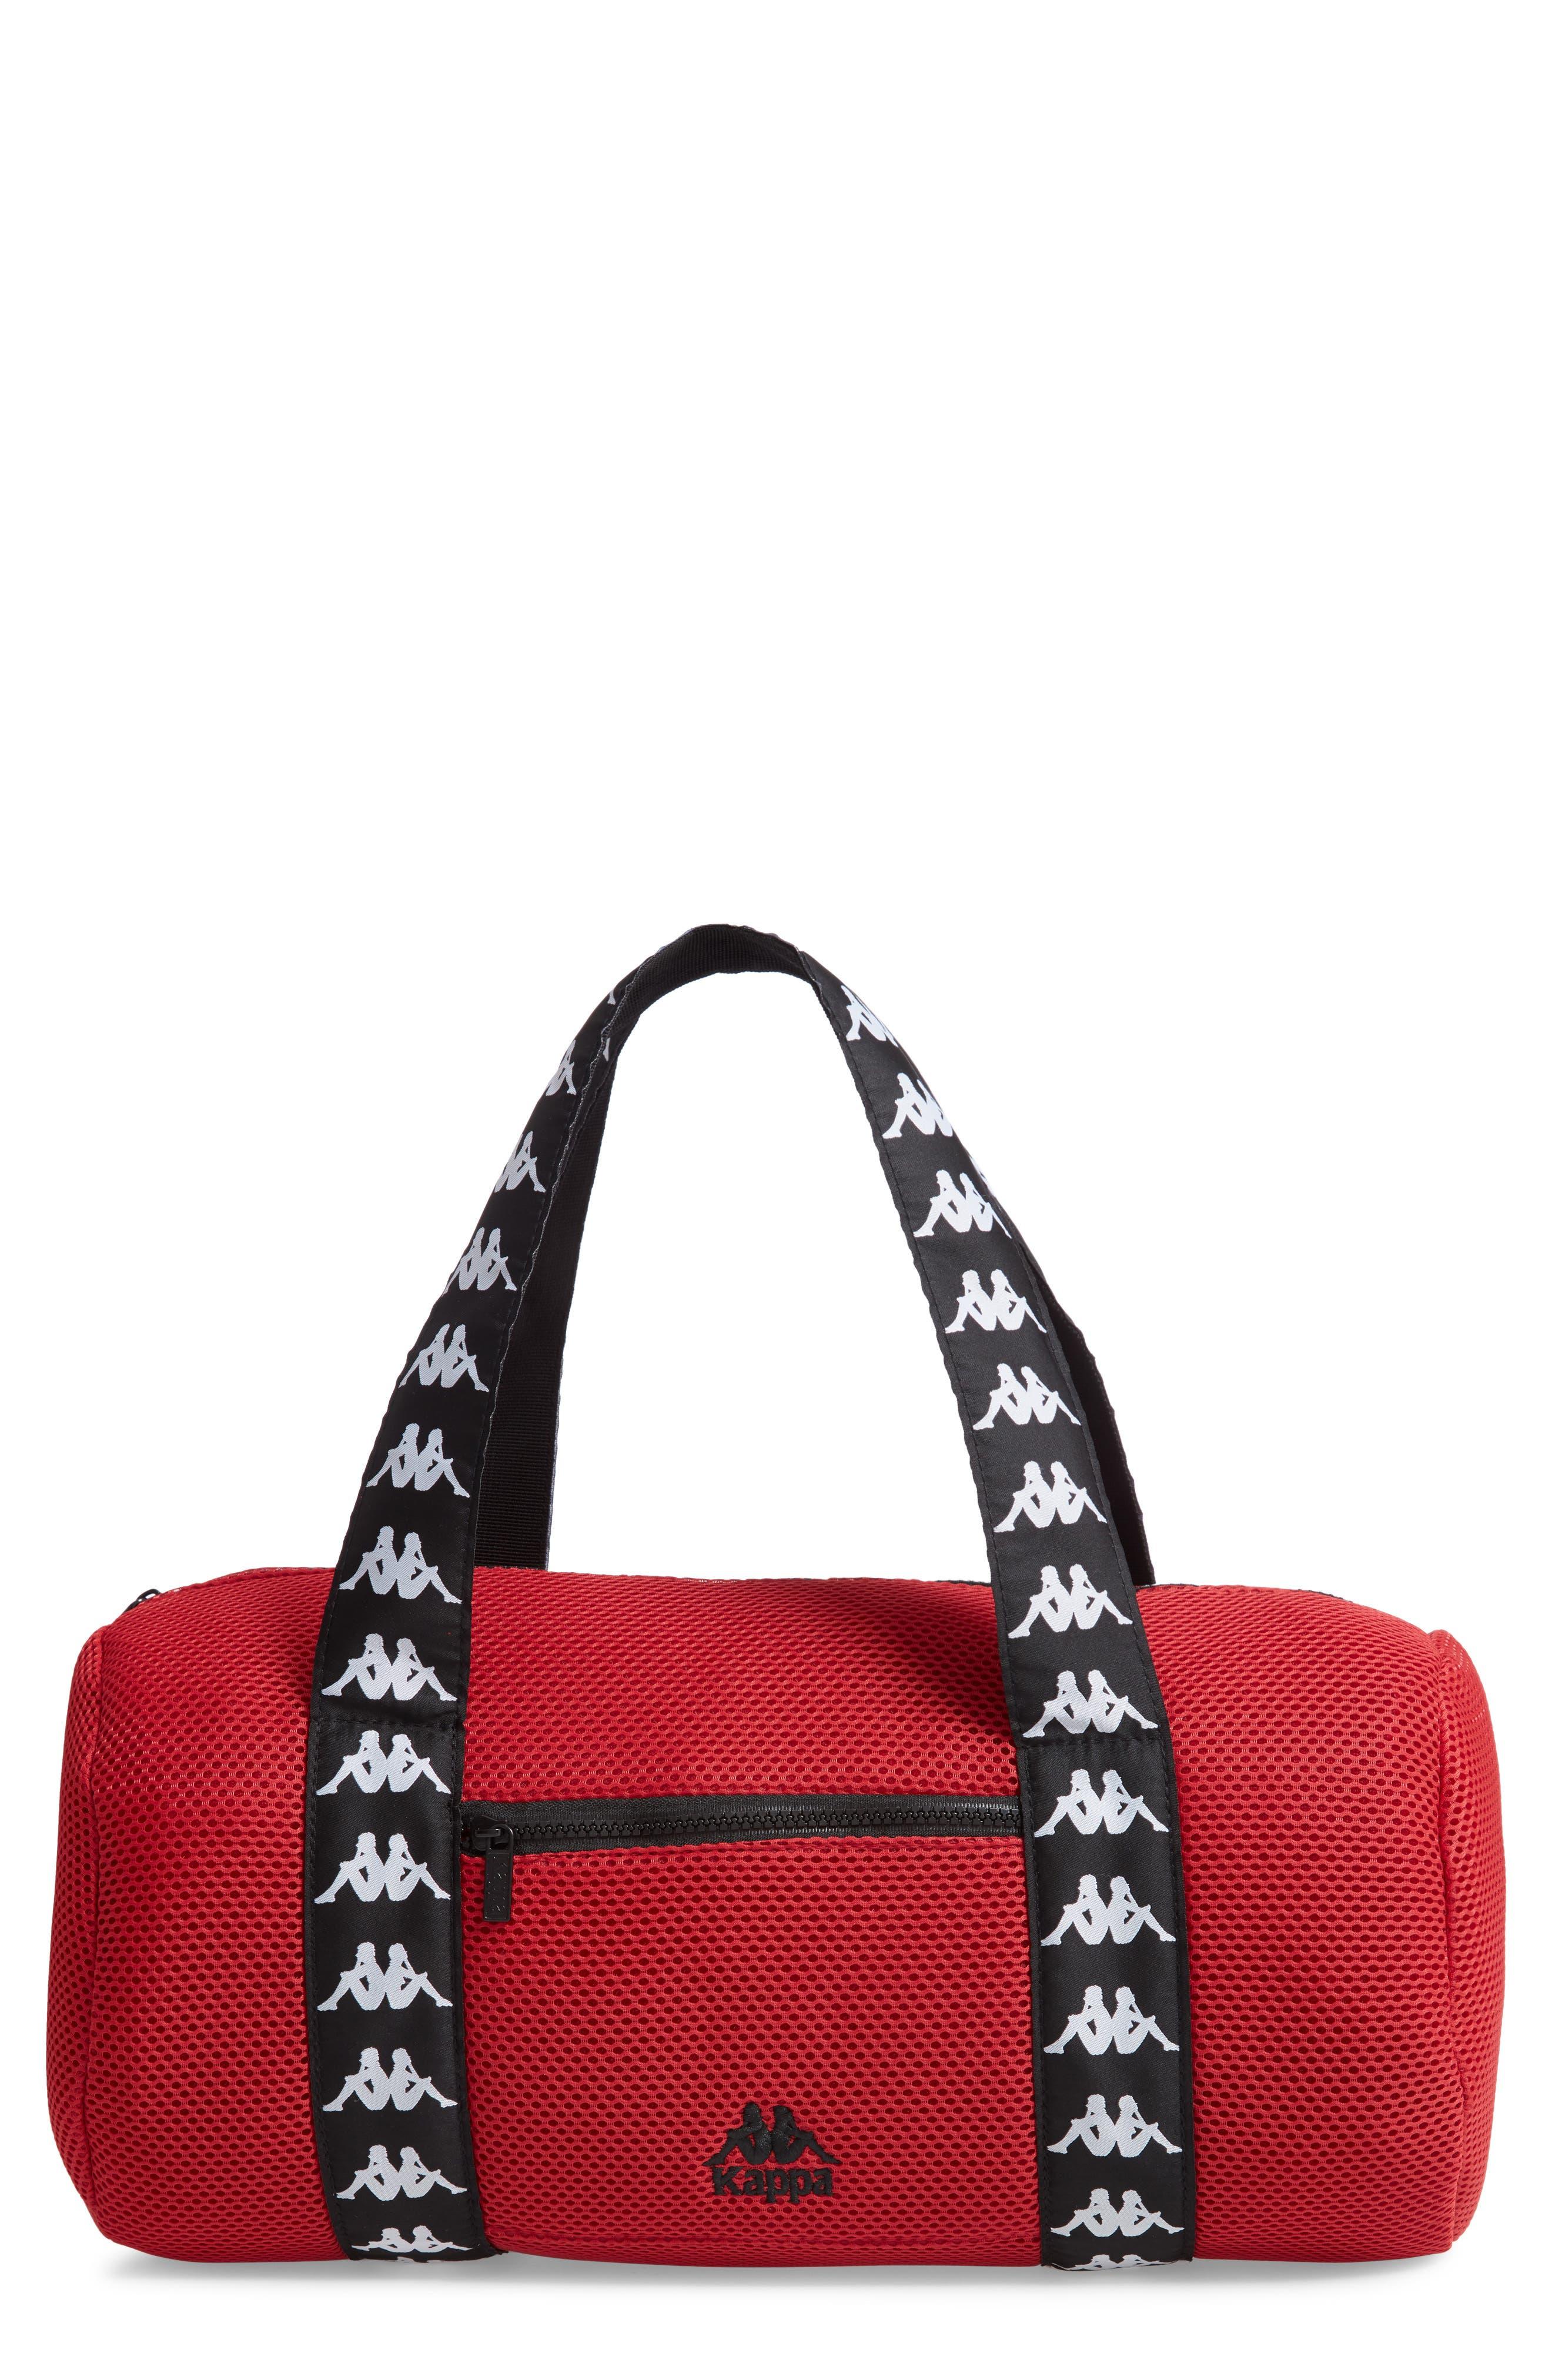 Large Mesh Athletic Duffel Bag,                         Main,                         color, RED DK-BLACK-WHITE